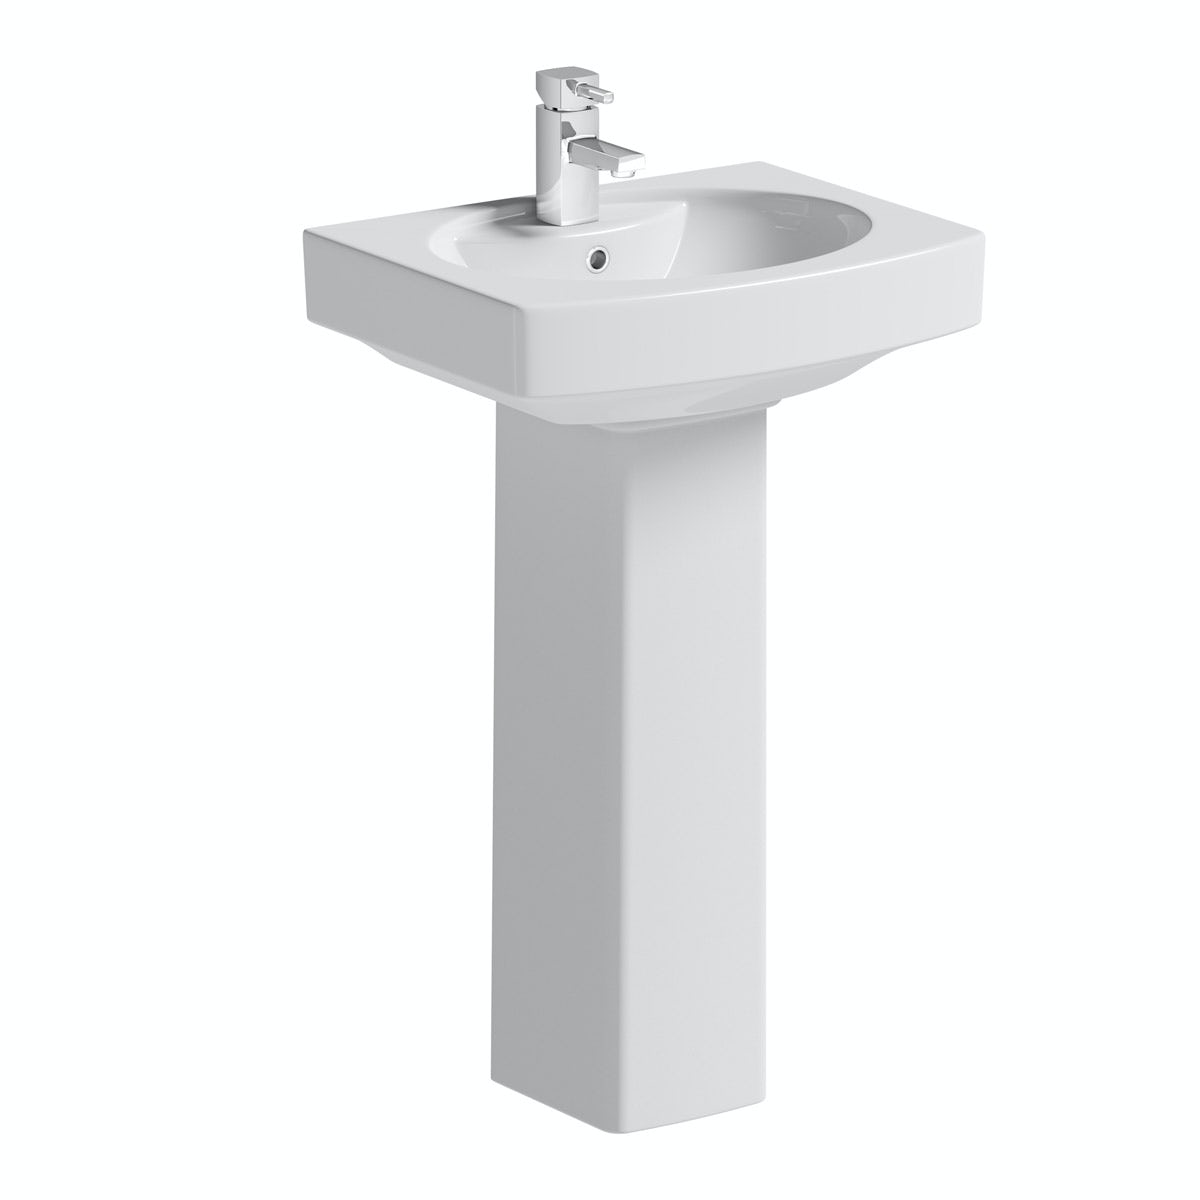 Wye Basin & Pedestal